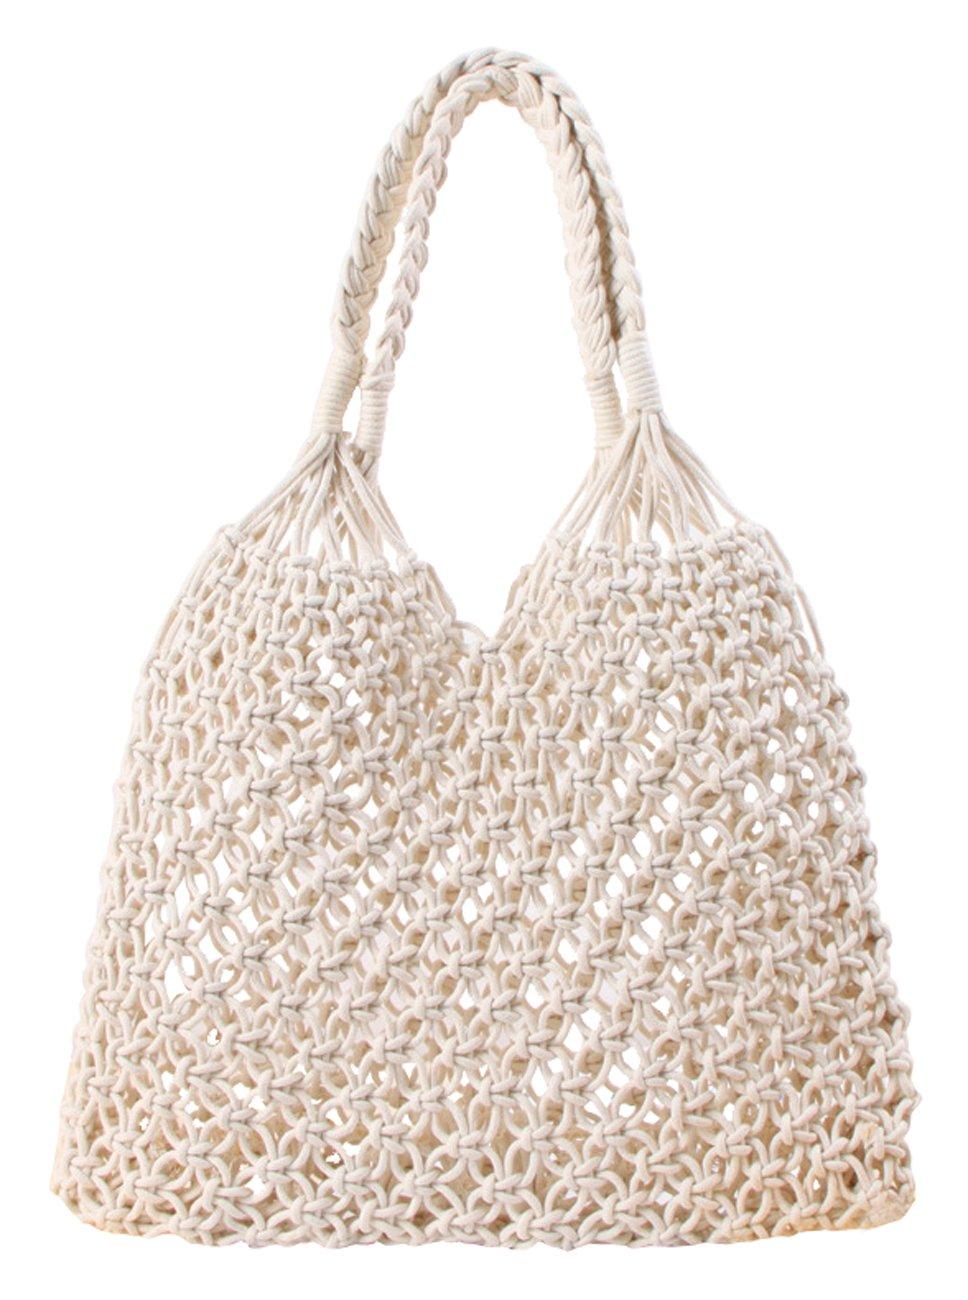 Beach Bag Tote Braided Handbag Women String Bag Summer Hobo Bag Travel Bag (Ivory)